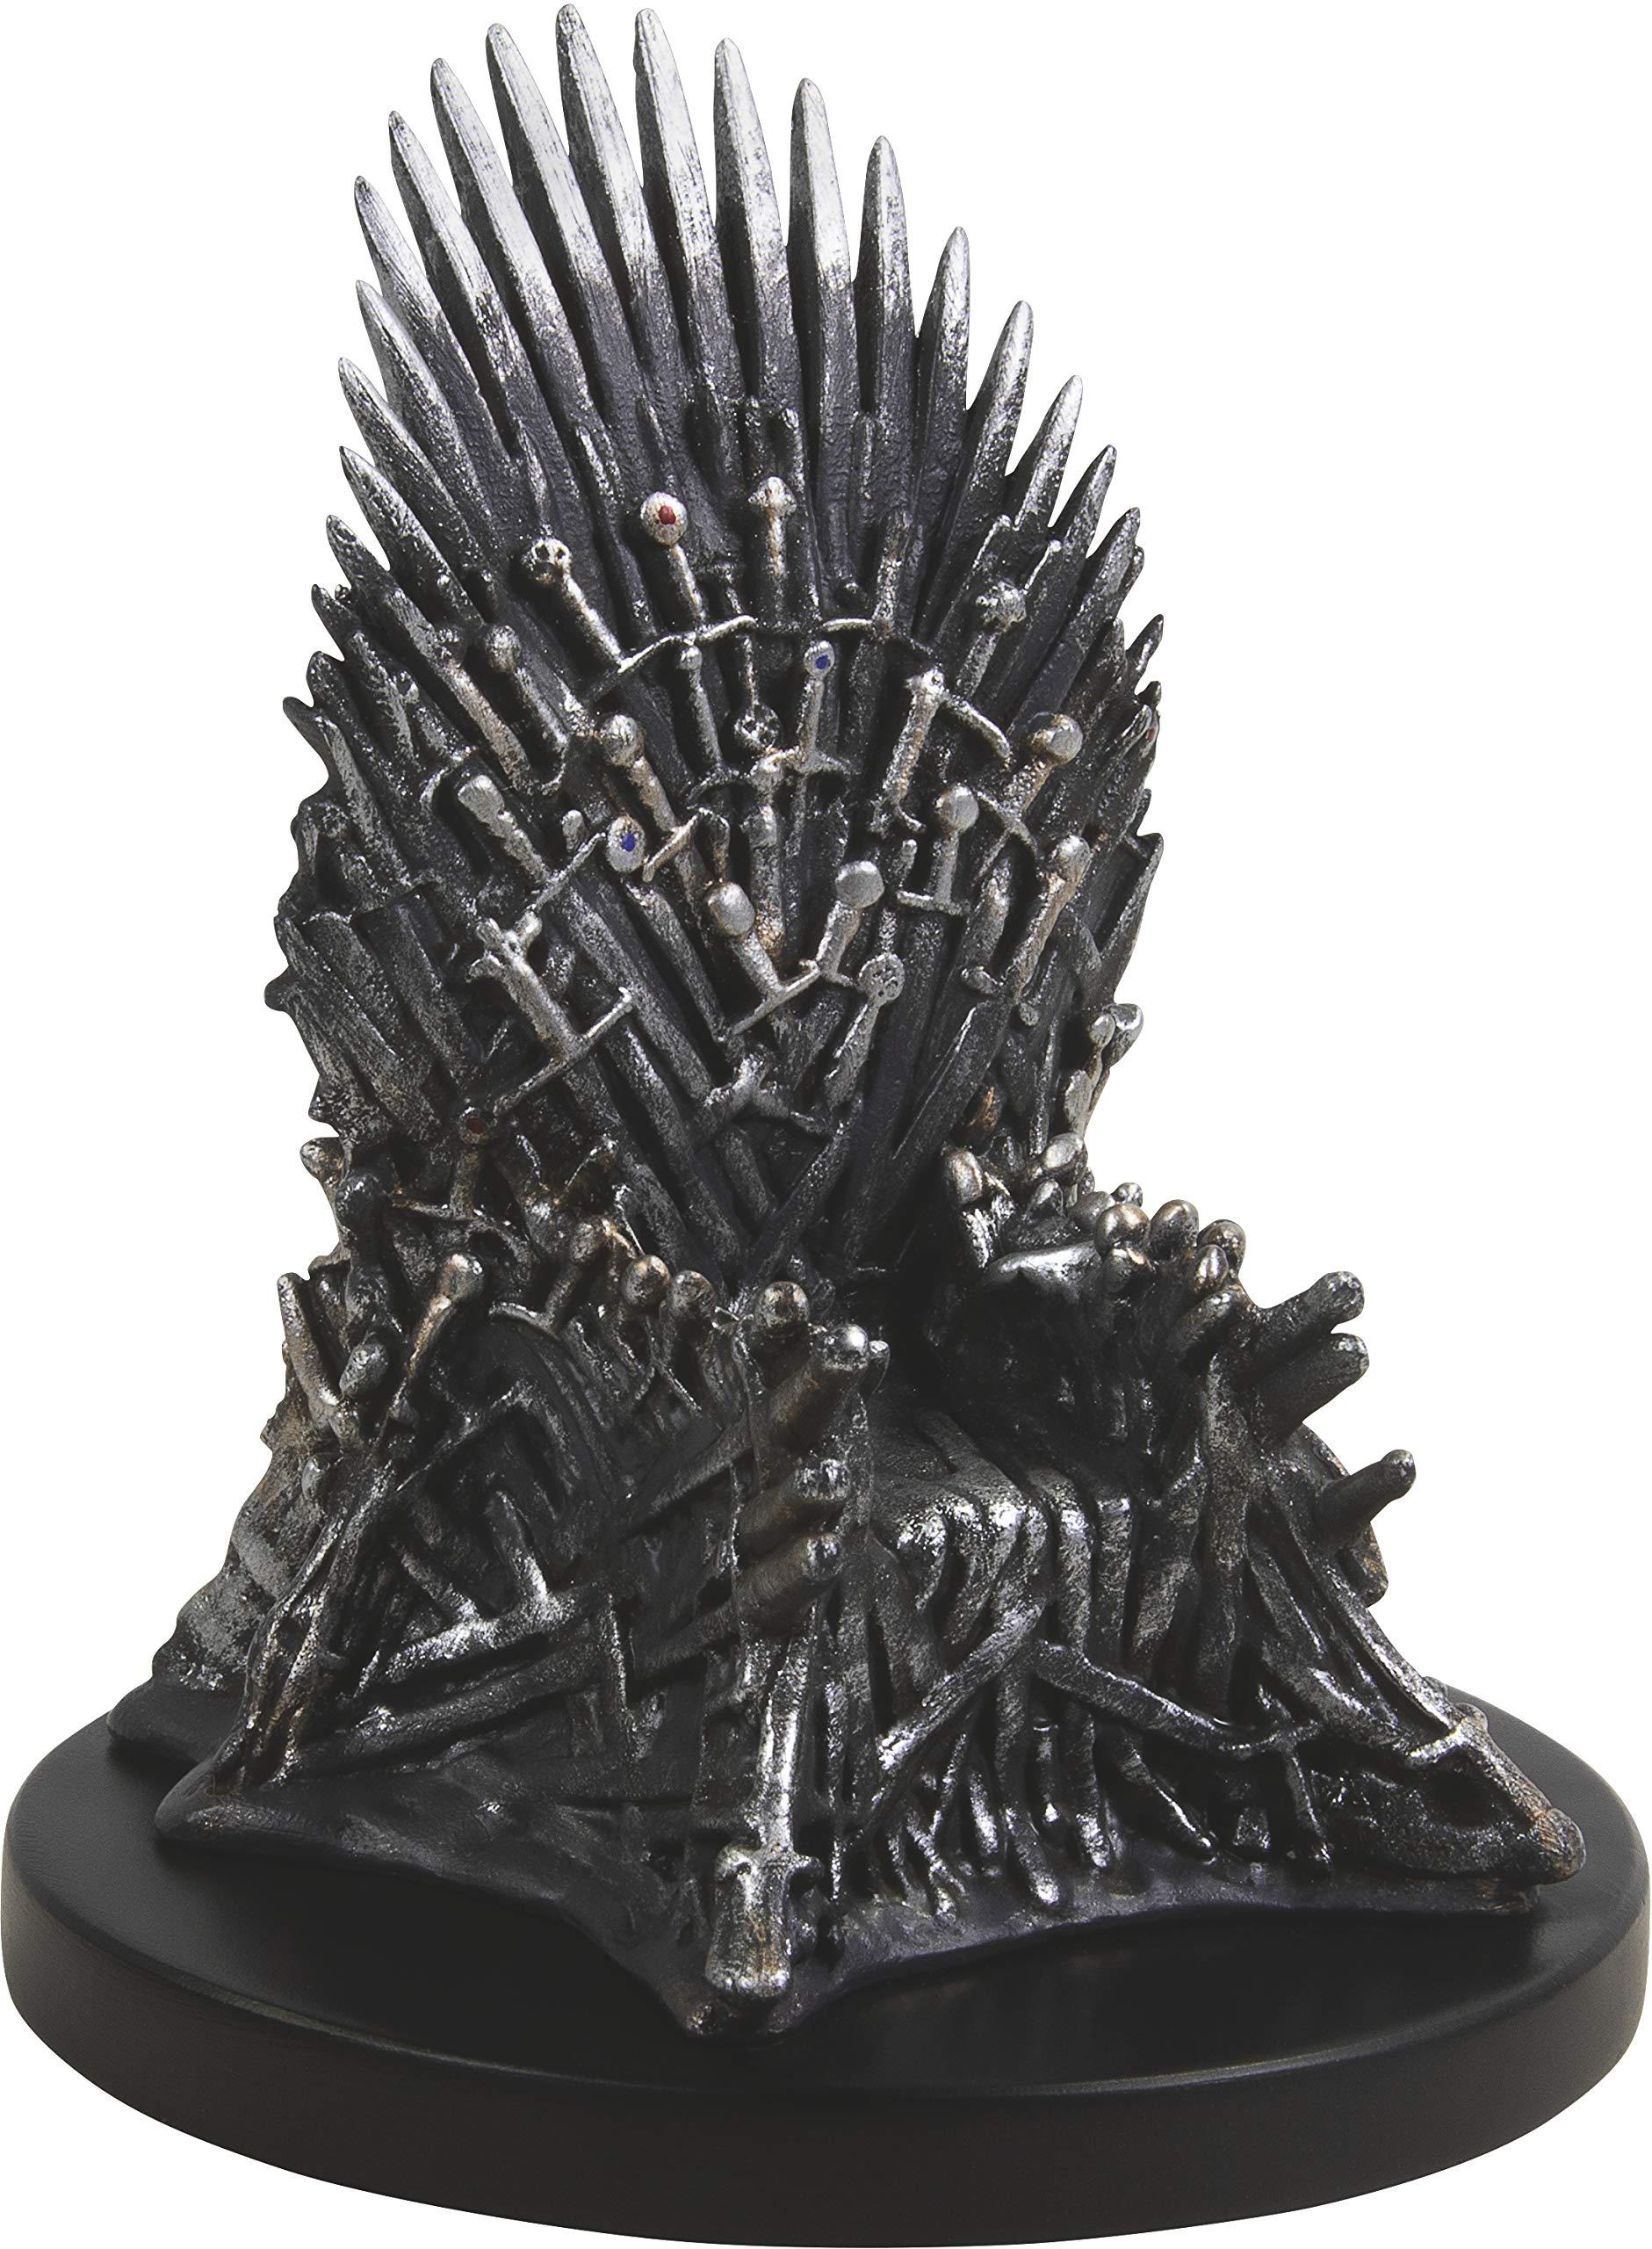 Dark Horse Deluxe Game of Thrones: 4'' Iron Throne Mini Replica by Dark Horse Deluxe